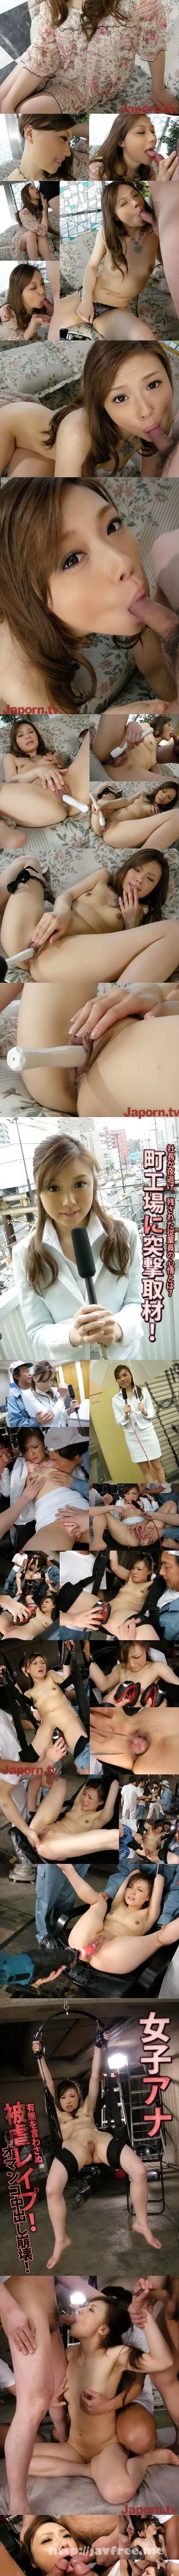 [RHJ 164] レッドホットジャム Vol.164 ヒメコレ : 広瀬藍子 広瀬藍子 RHJ Red Hot Jam Aiko Hirose